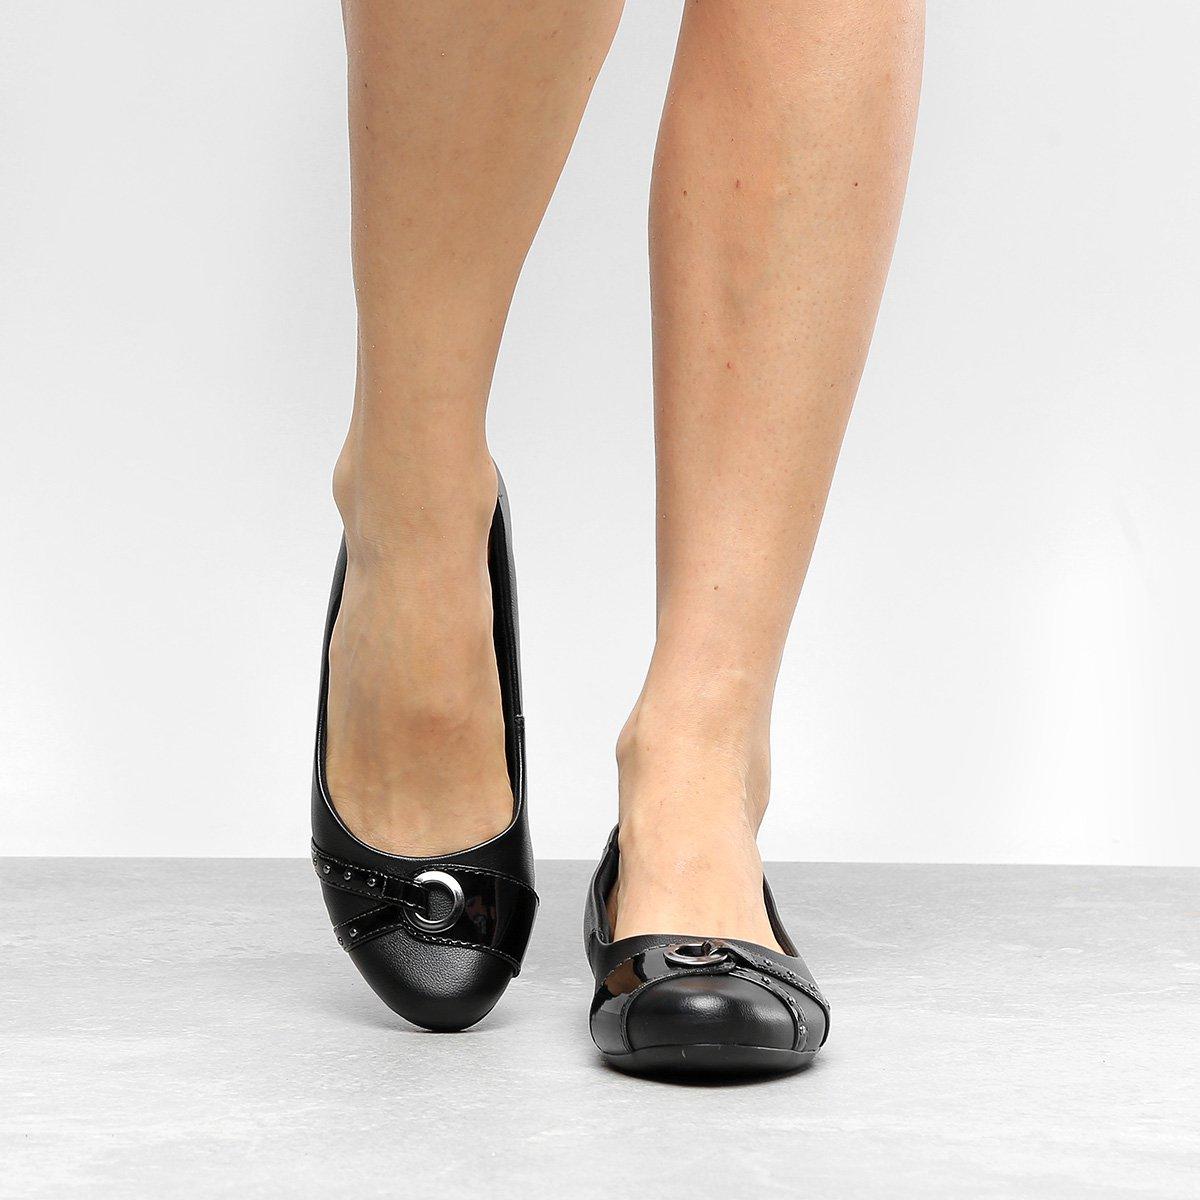 Sapatilha Comfortflex Salto Feminina Multi Metais Preto Embutido Metais Multi Comfortflex Sapatilha Salto Embutido rrqdHPxn